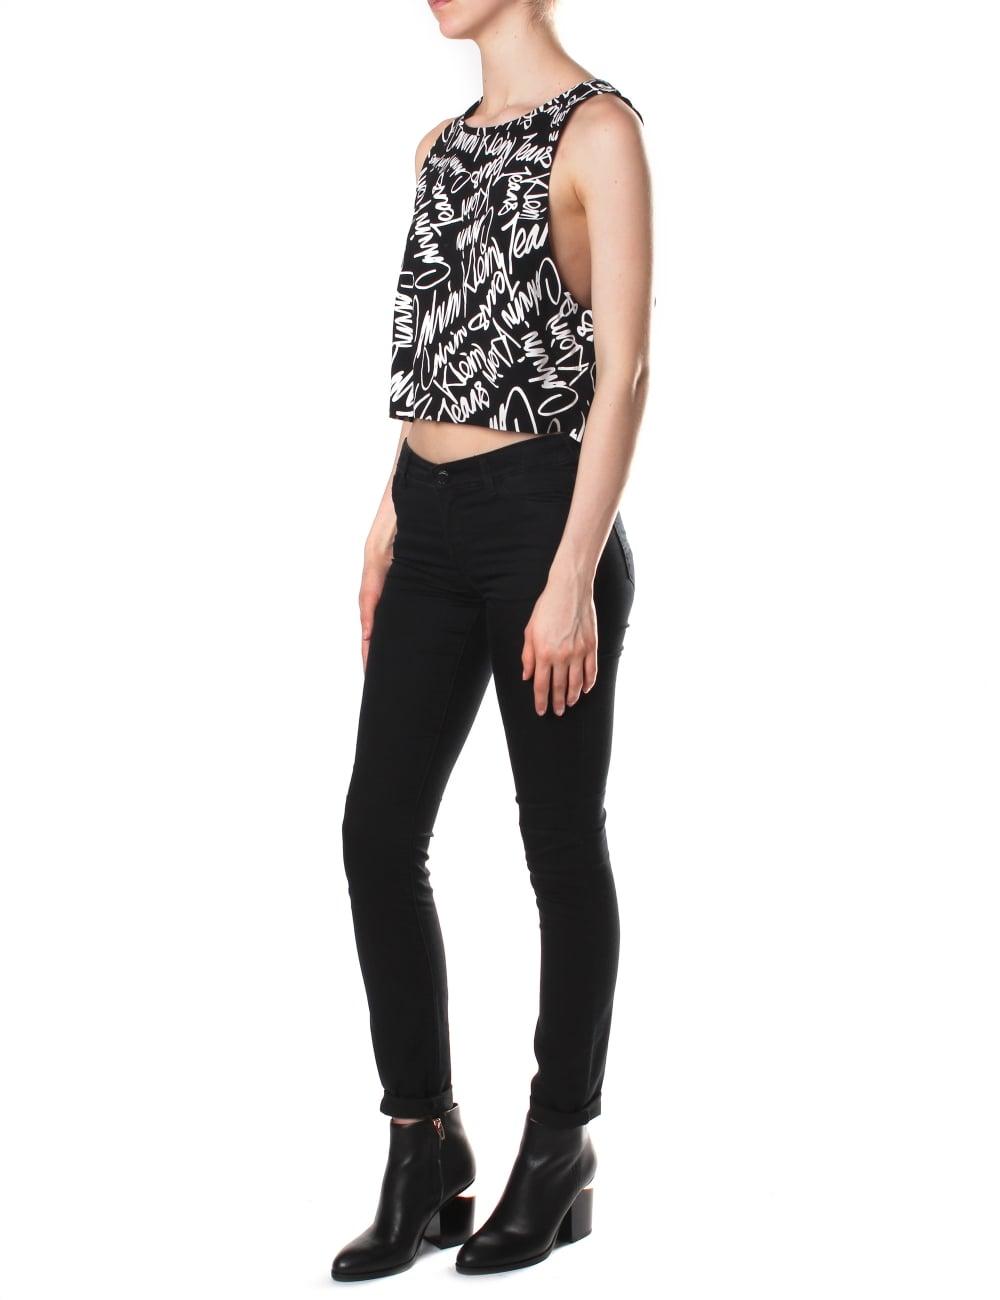 a798196f37846 Calvin Klein Women s Tendel 3 Cropped Graffiti Top